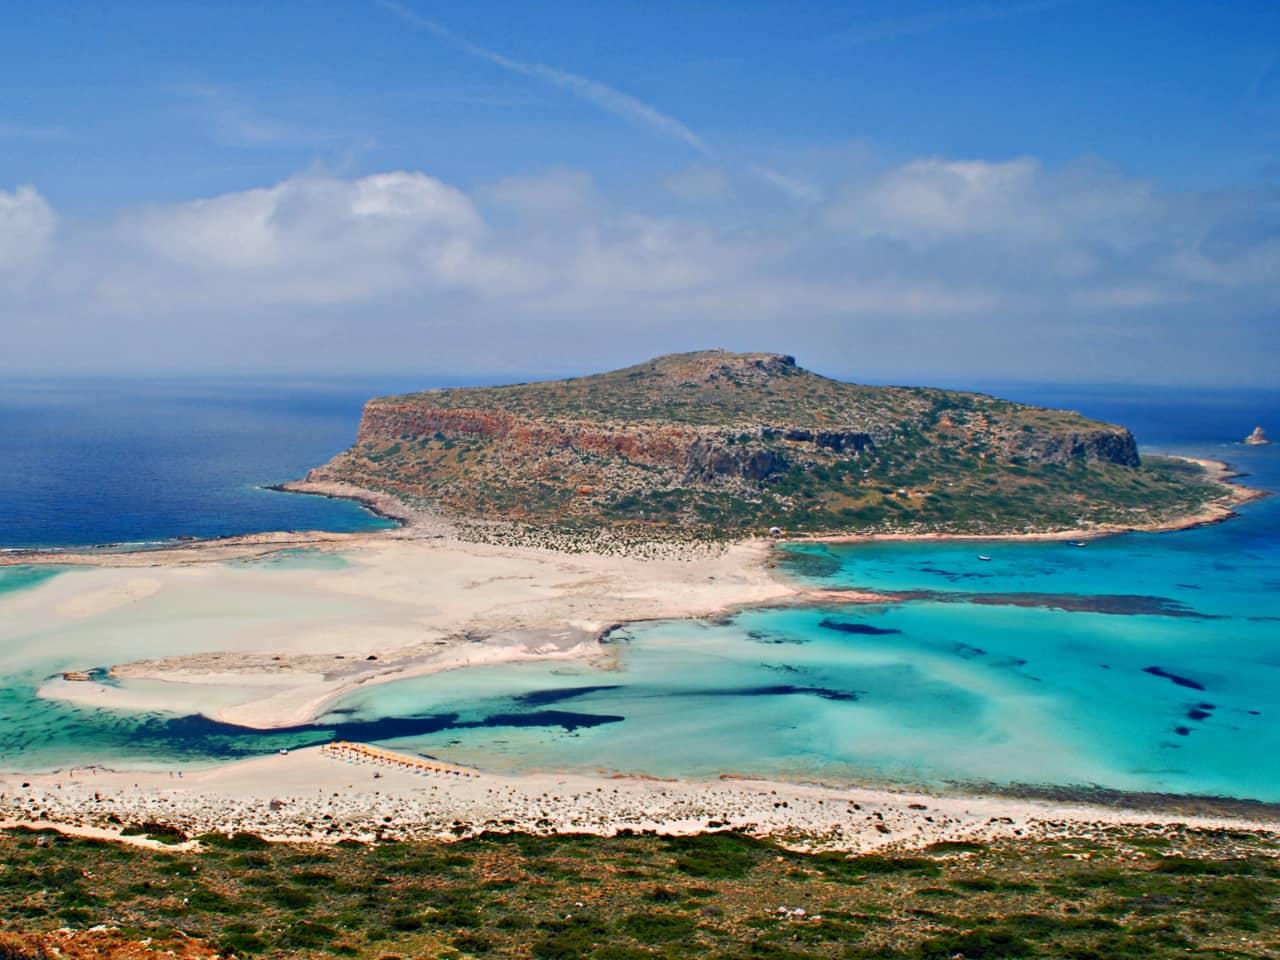 Private Speedboat Charter to Balos Lagoon Gramvousa Island, best speedboat tours chania crete, best boat trip to gramvousa balos lagoon, best activities chania crete